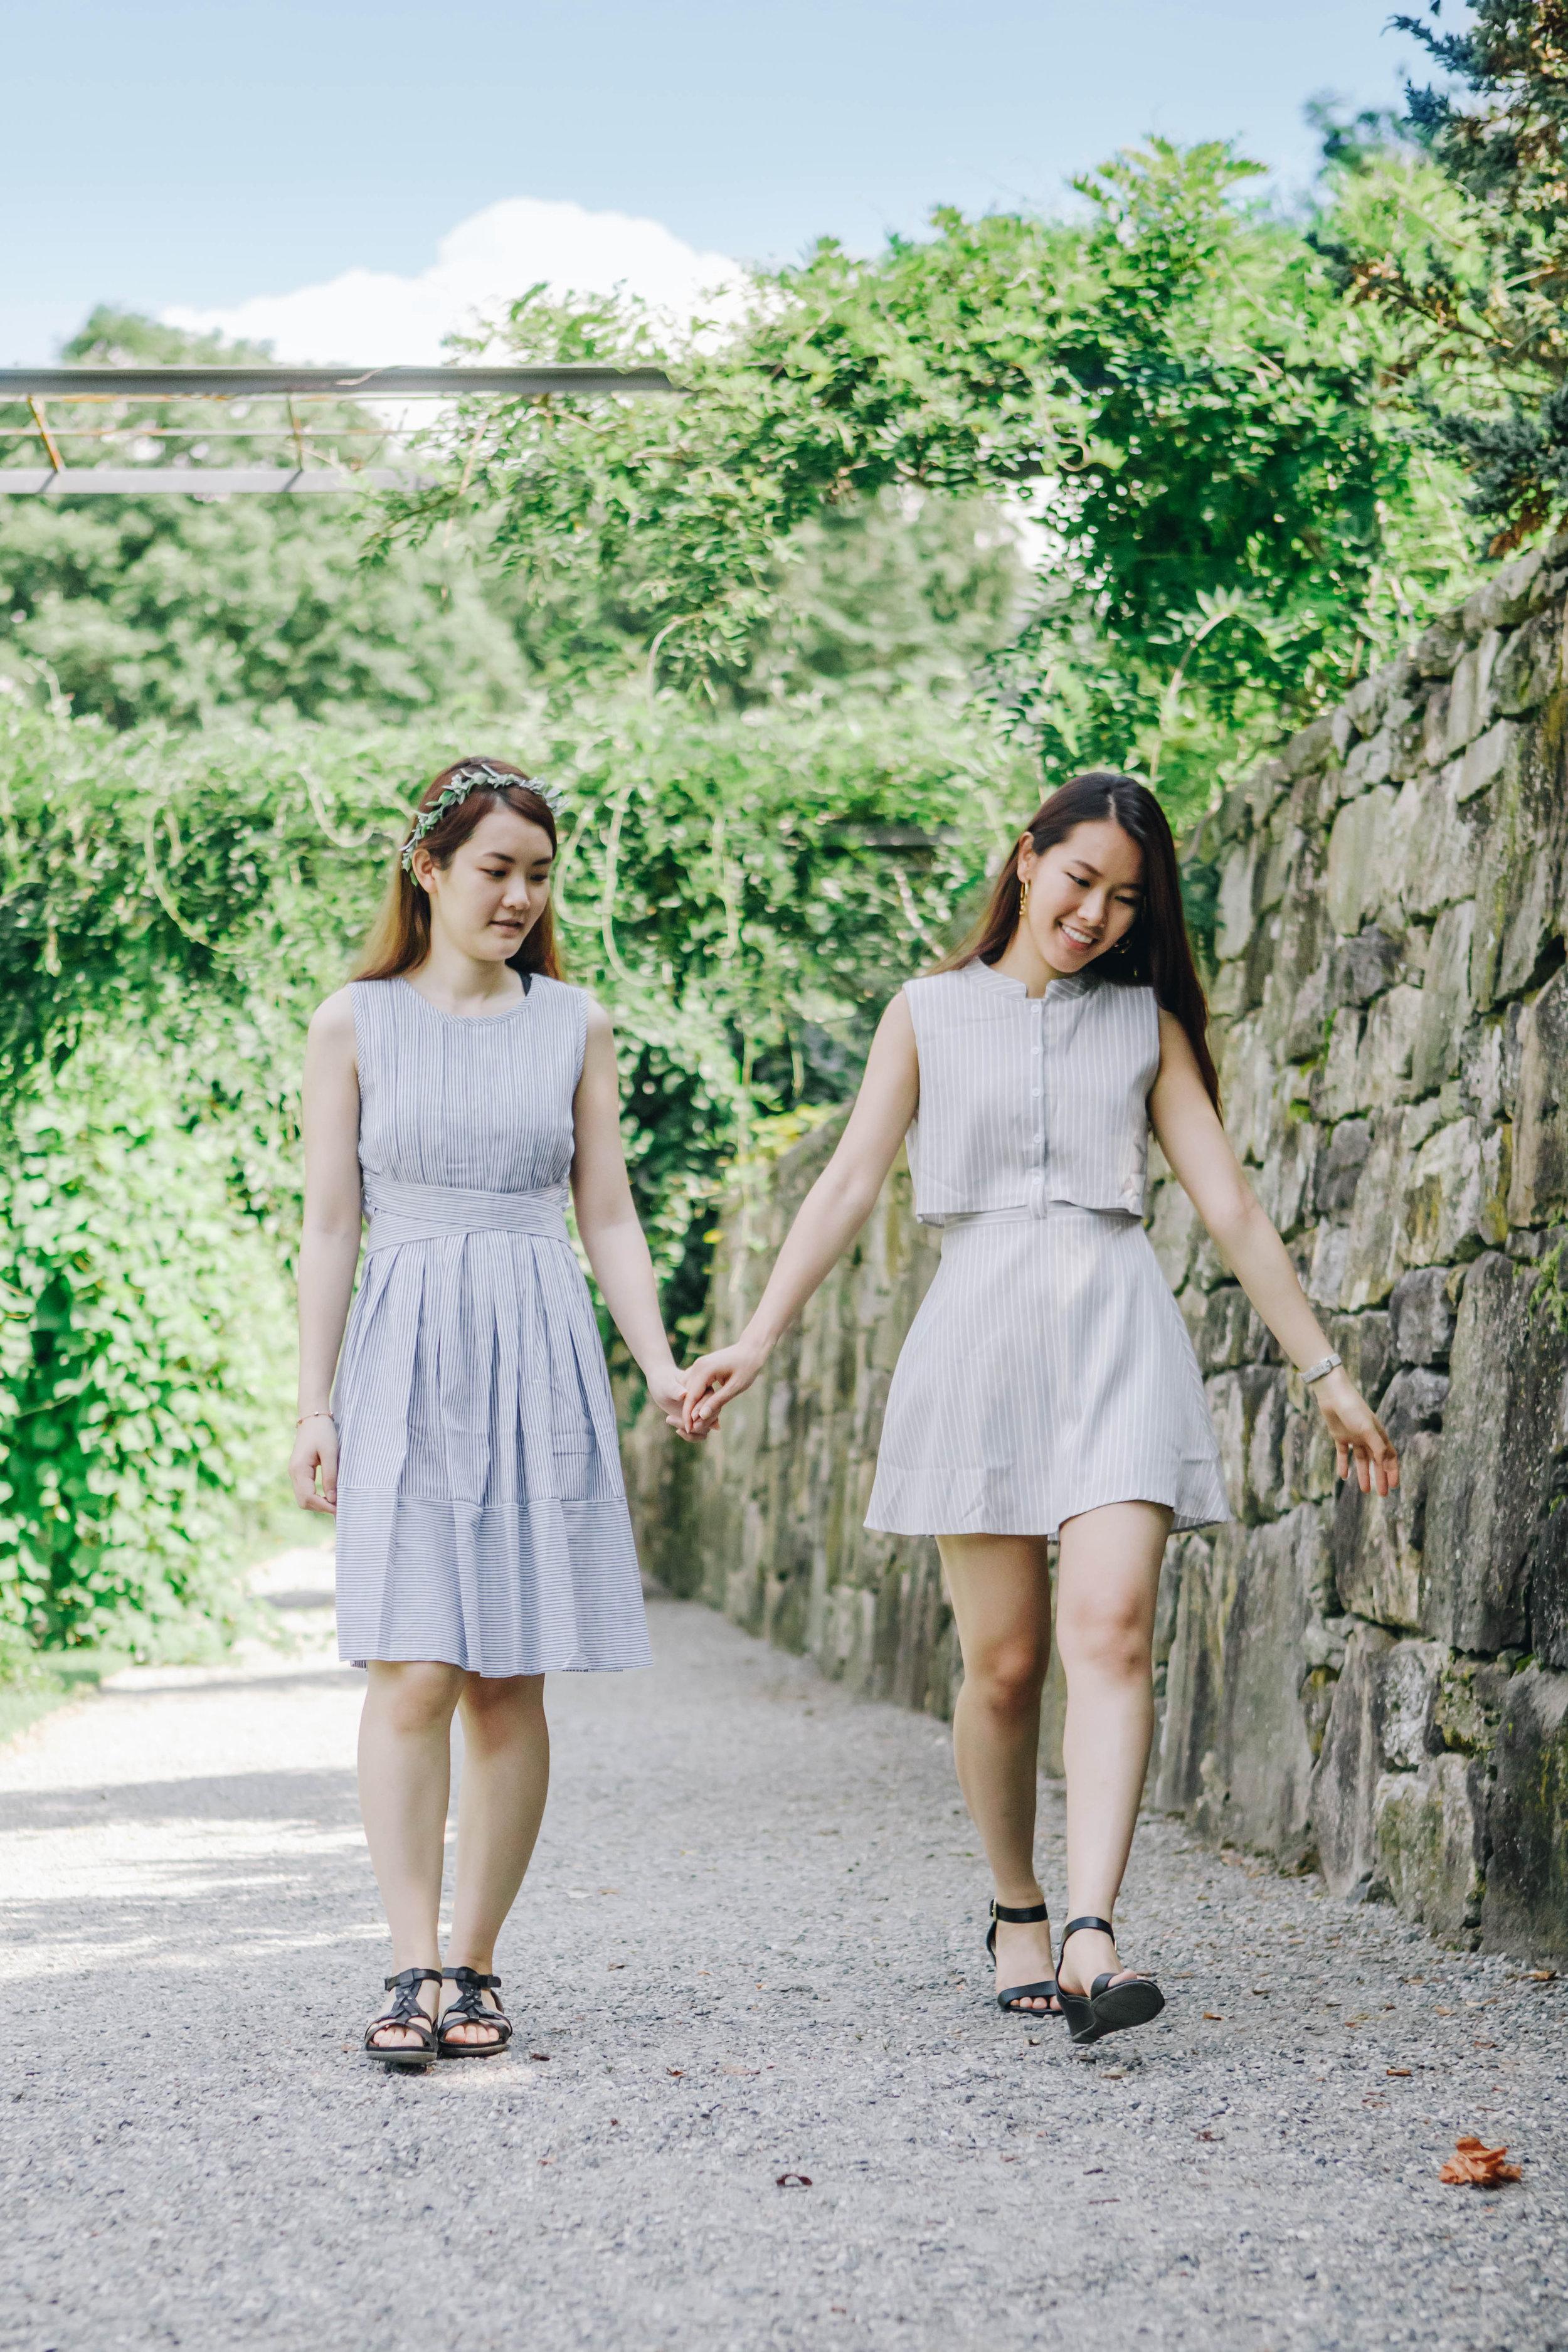 sisters-in-summertime-eva-loh-11.jpg